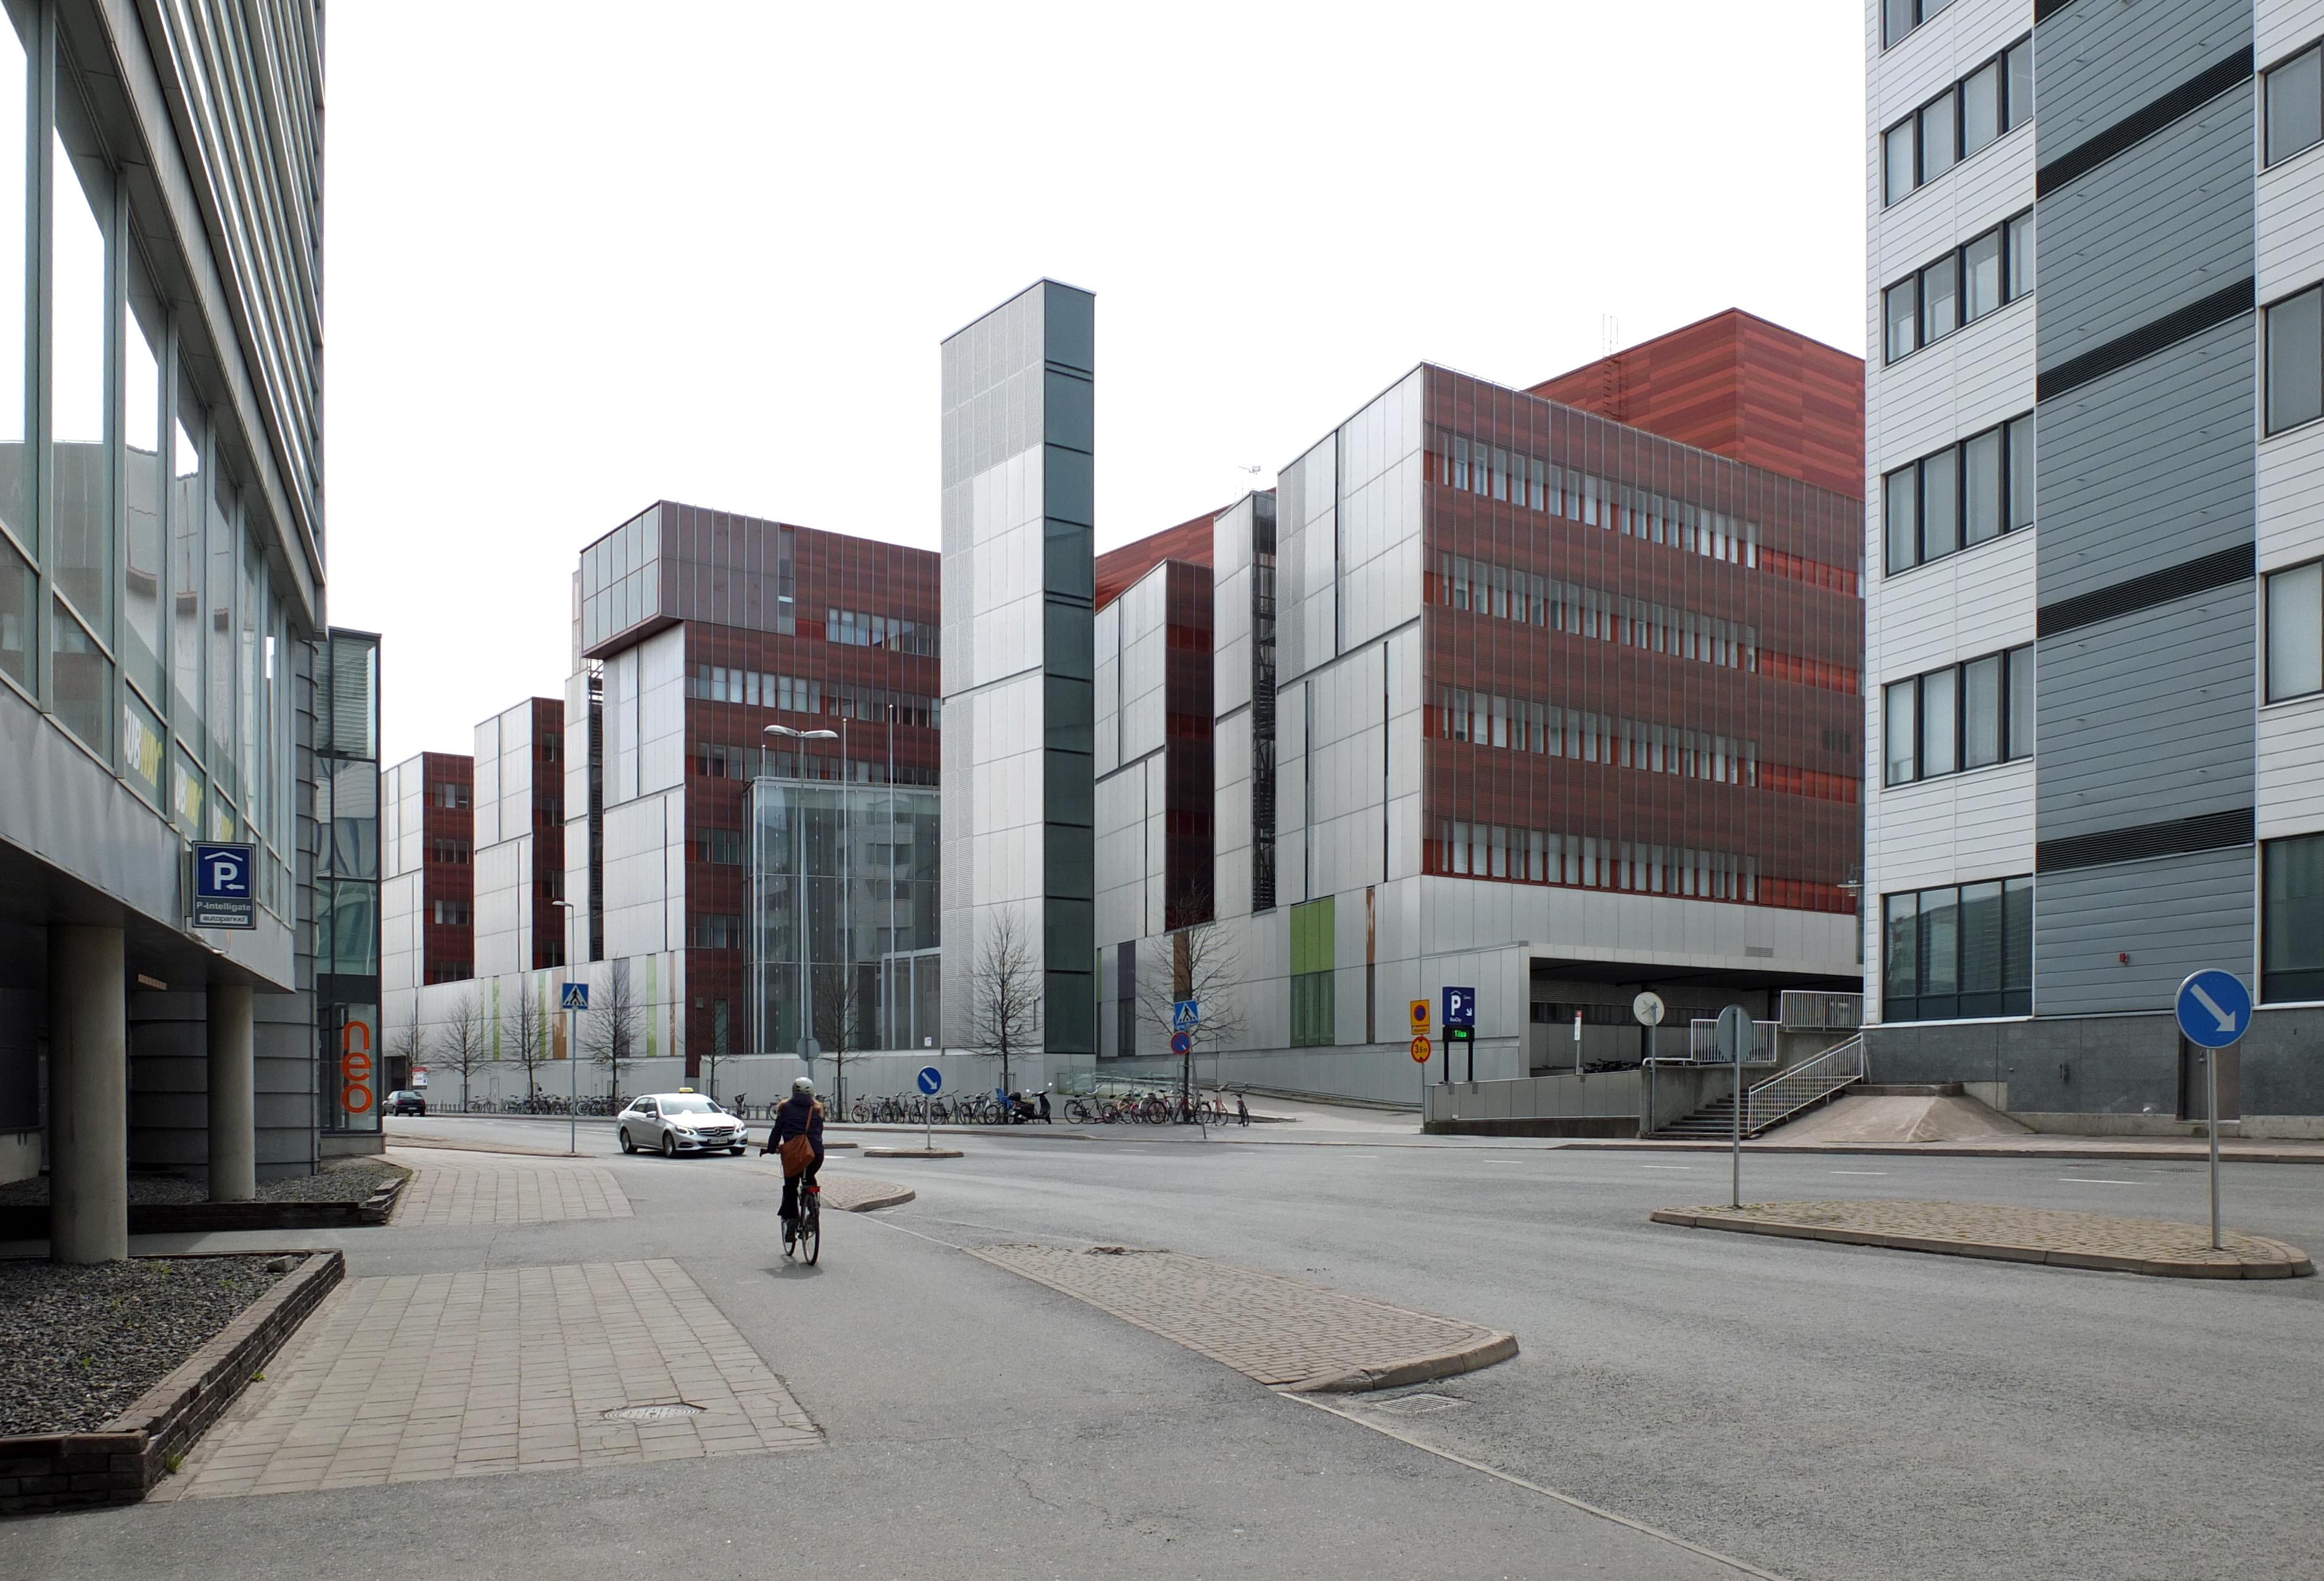 Ammattikorkeakoulu Helsinki